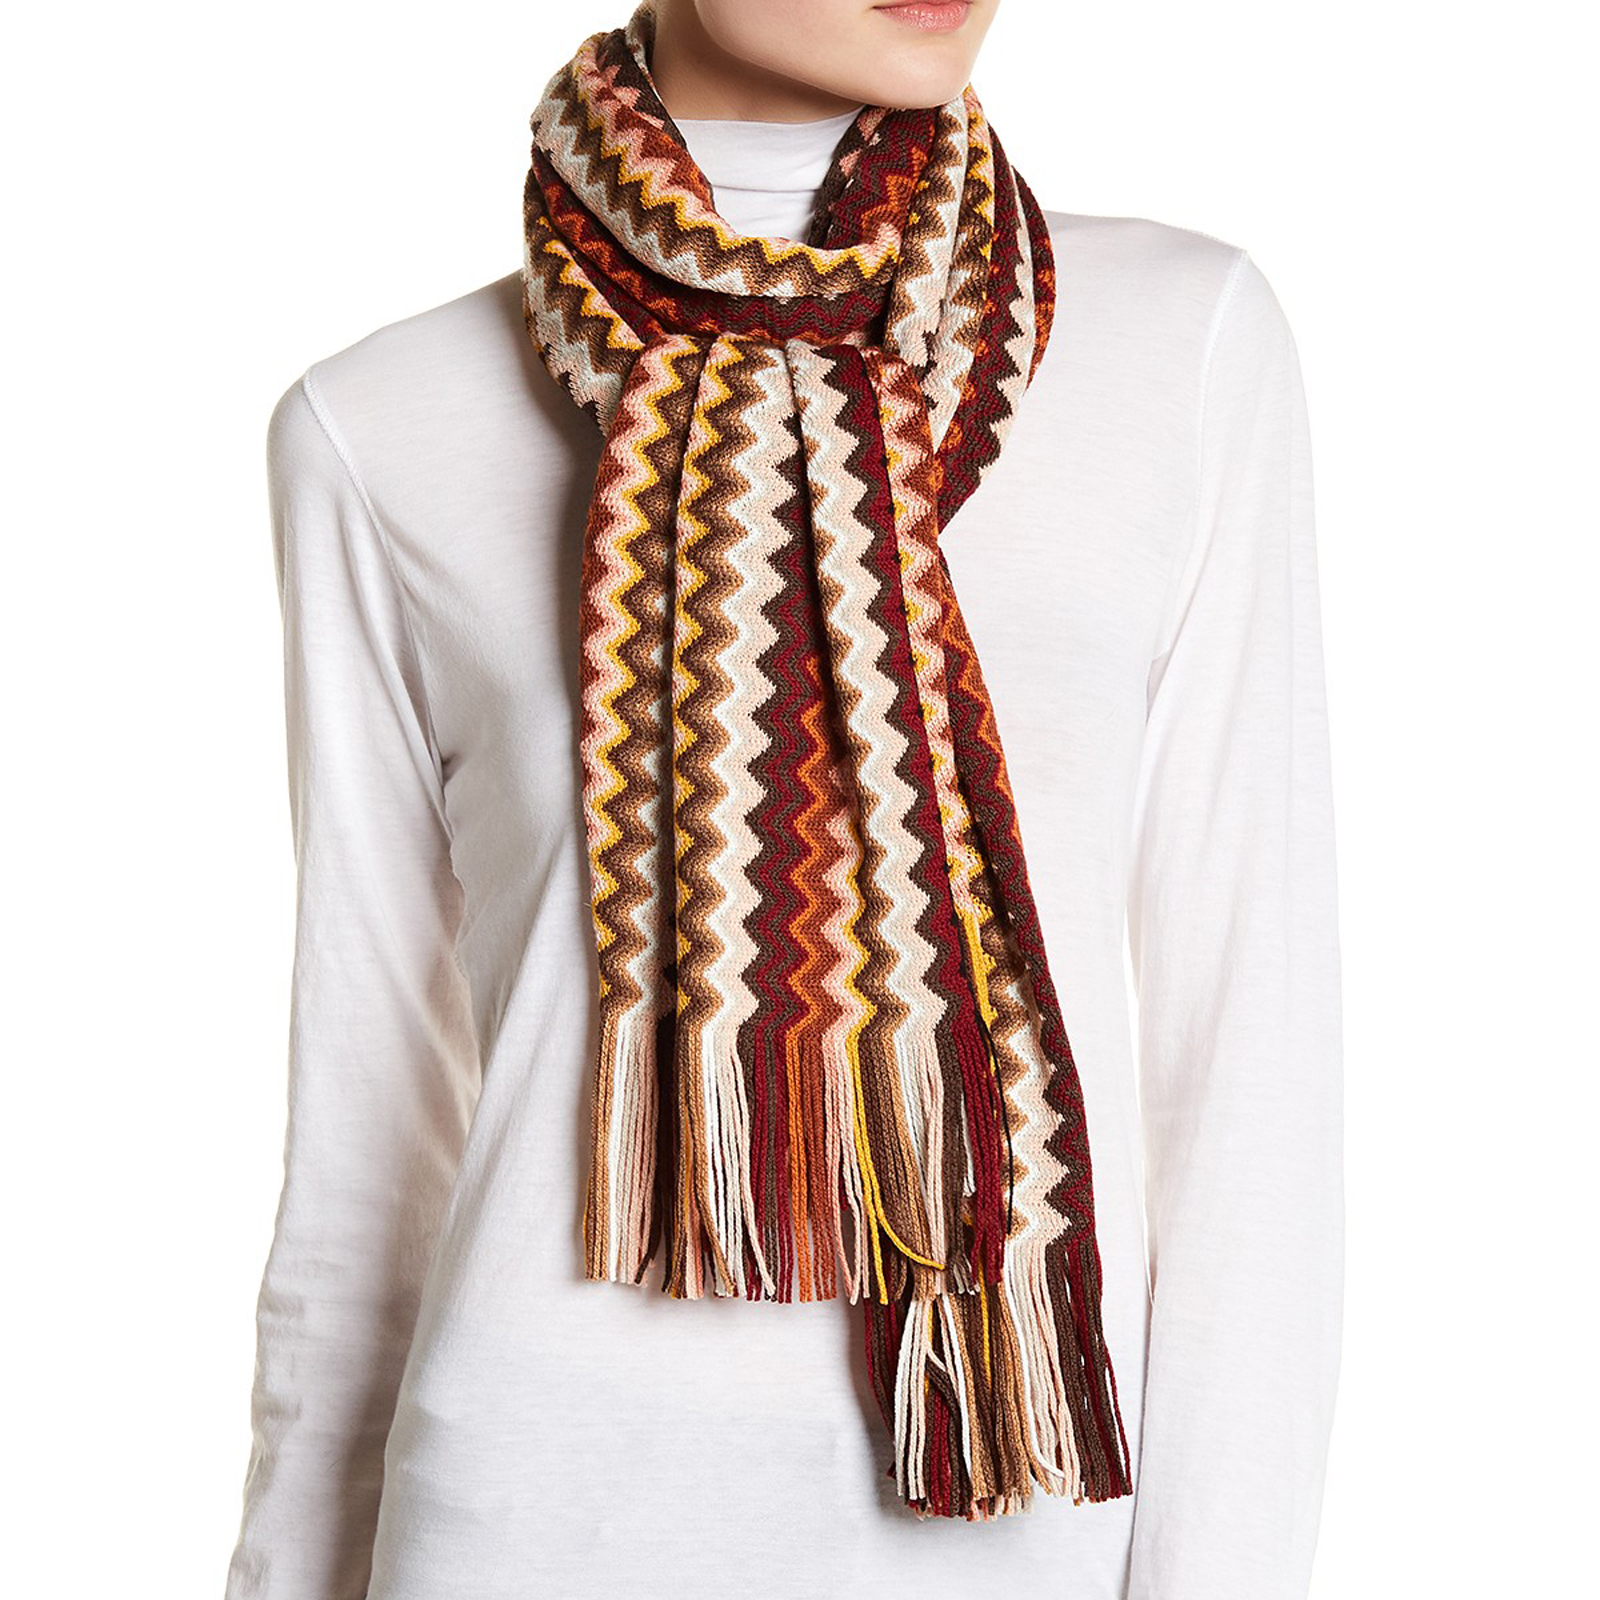 Pungles - Online Shopping Store - Knit Wool Blend Fringe Brown Beige ...